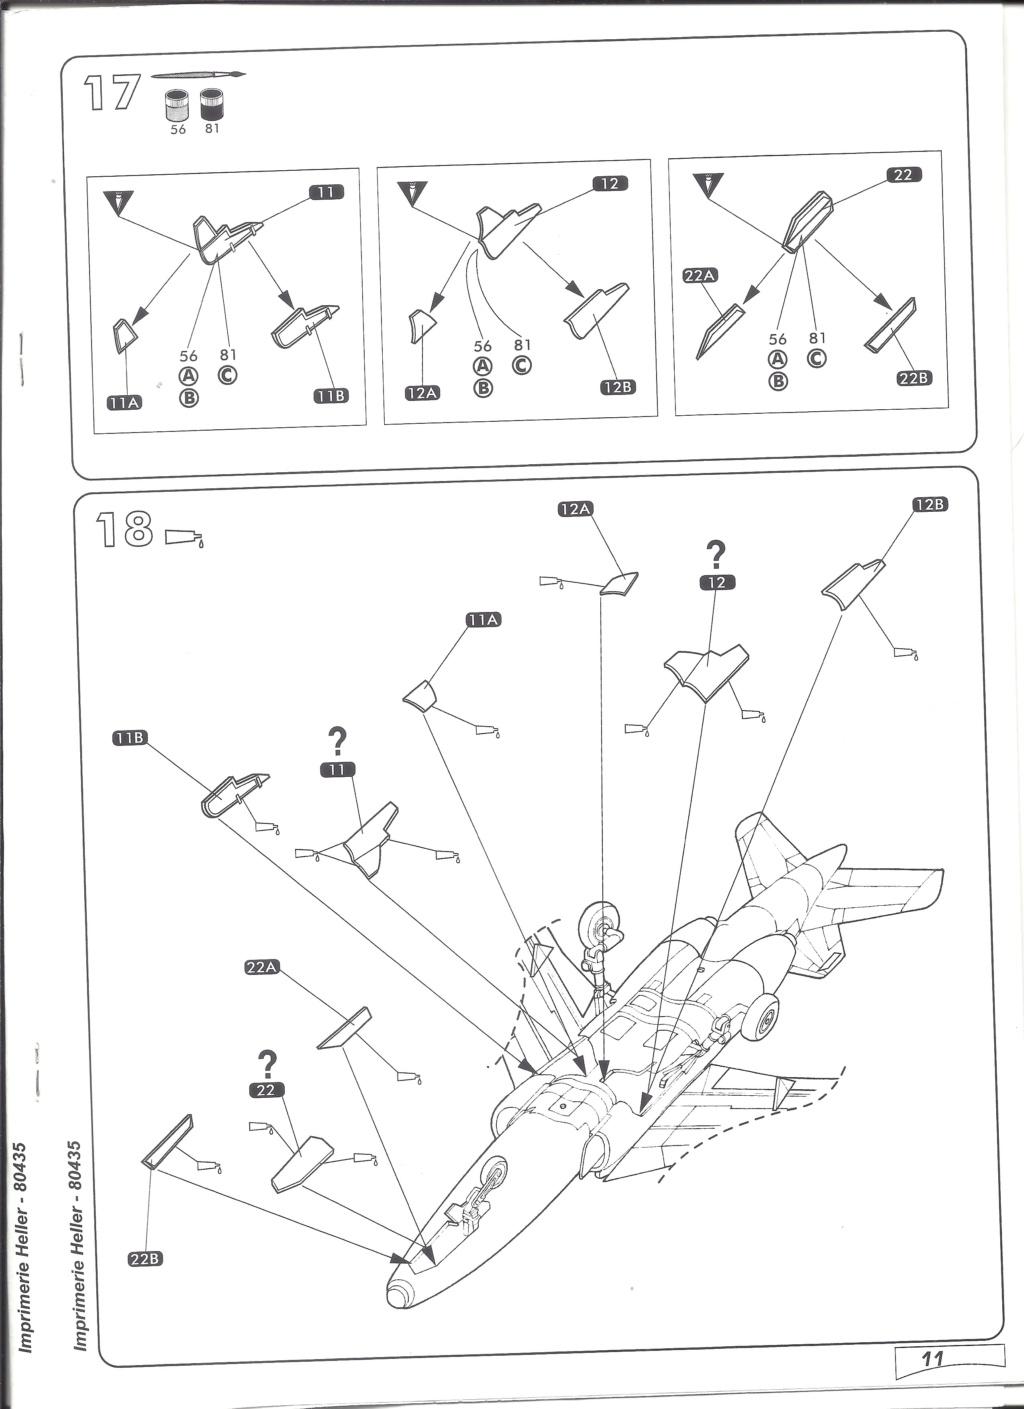 DASSAULT-BREGUET / DORNIER ALPHA JET 1/48ème Réf 80435 Notice Helle666